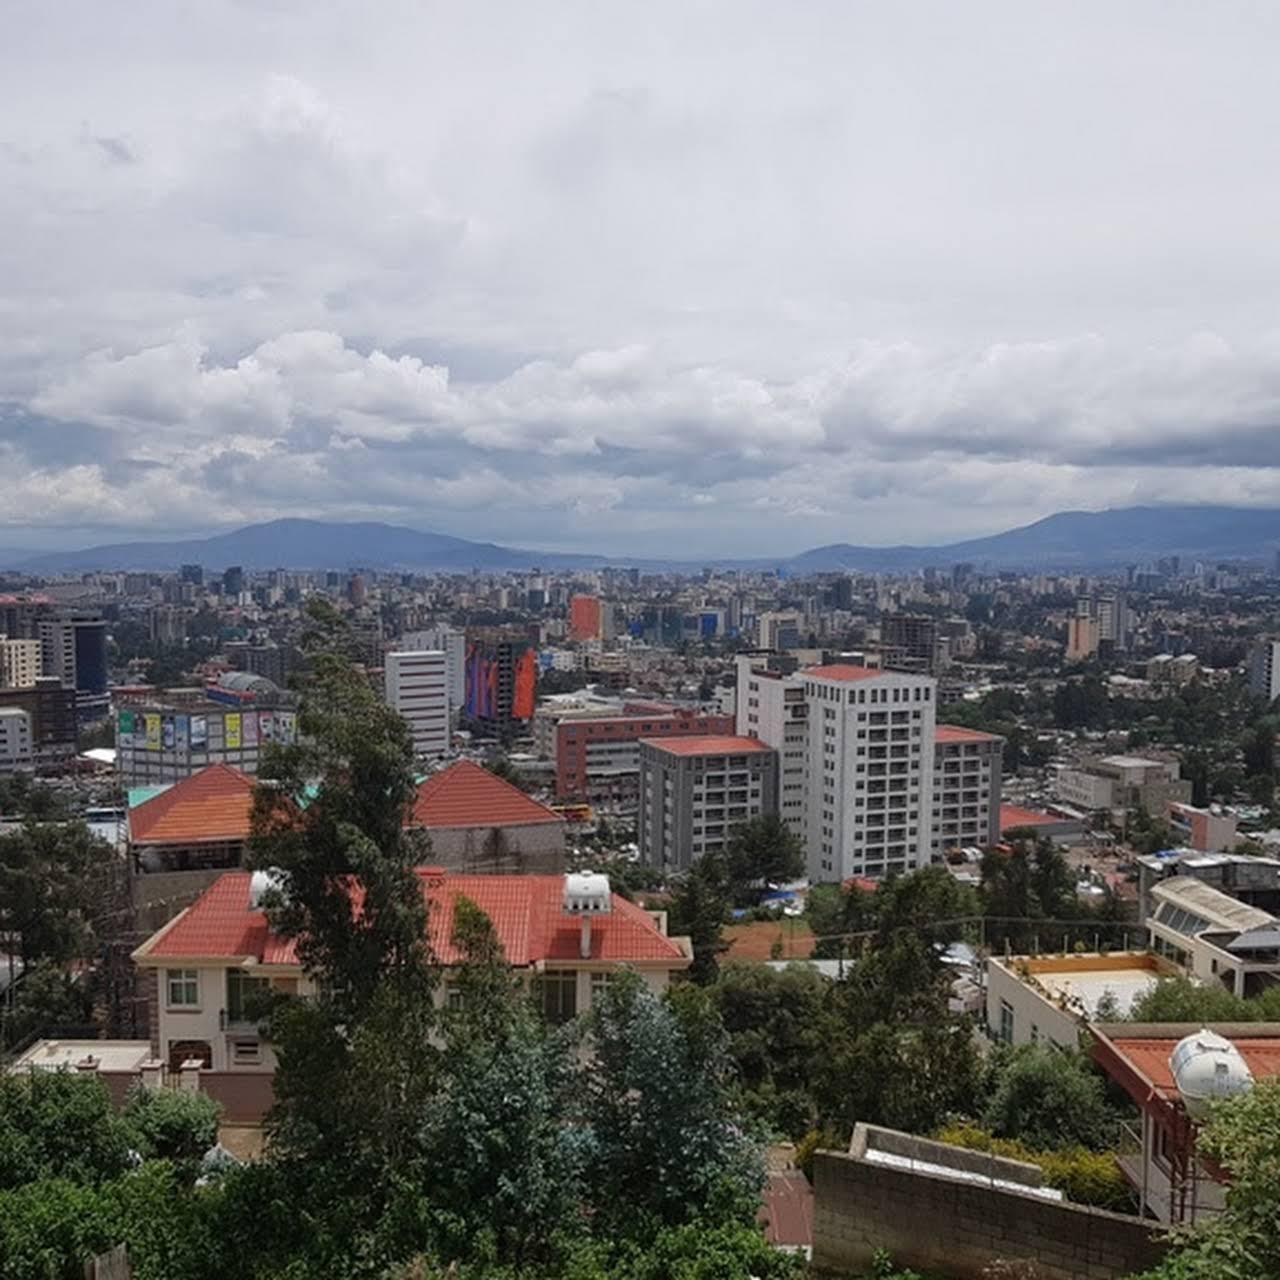 Muluken Girma Addis Ababa Tour Guide - Tour Operator and